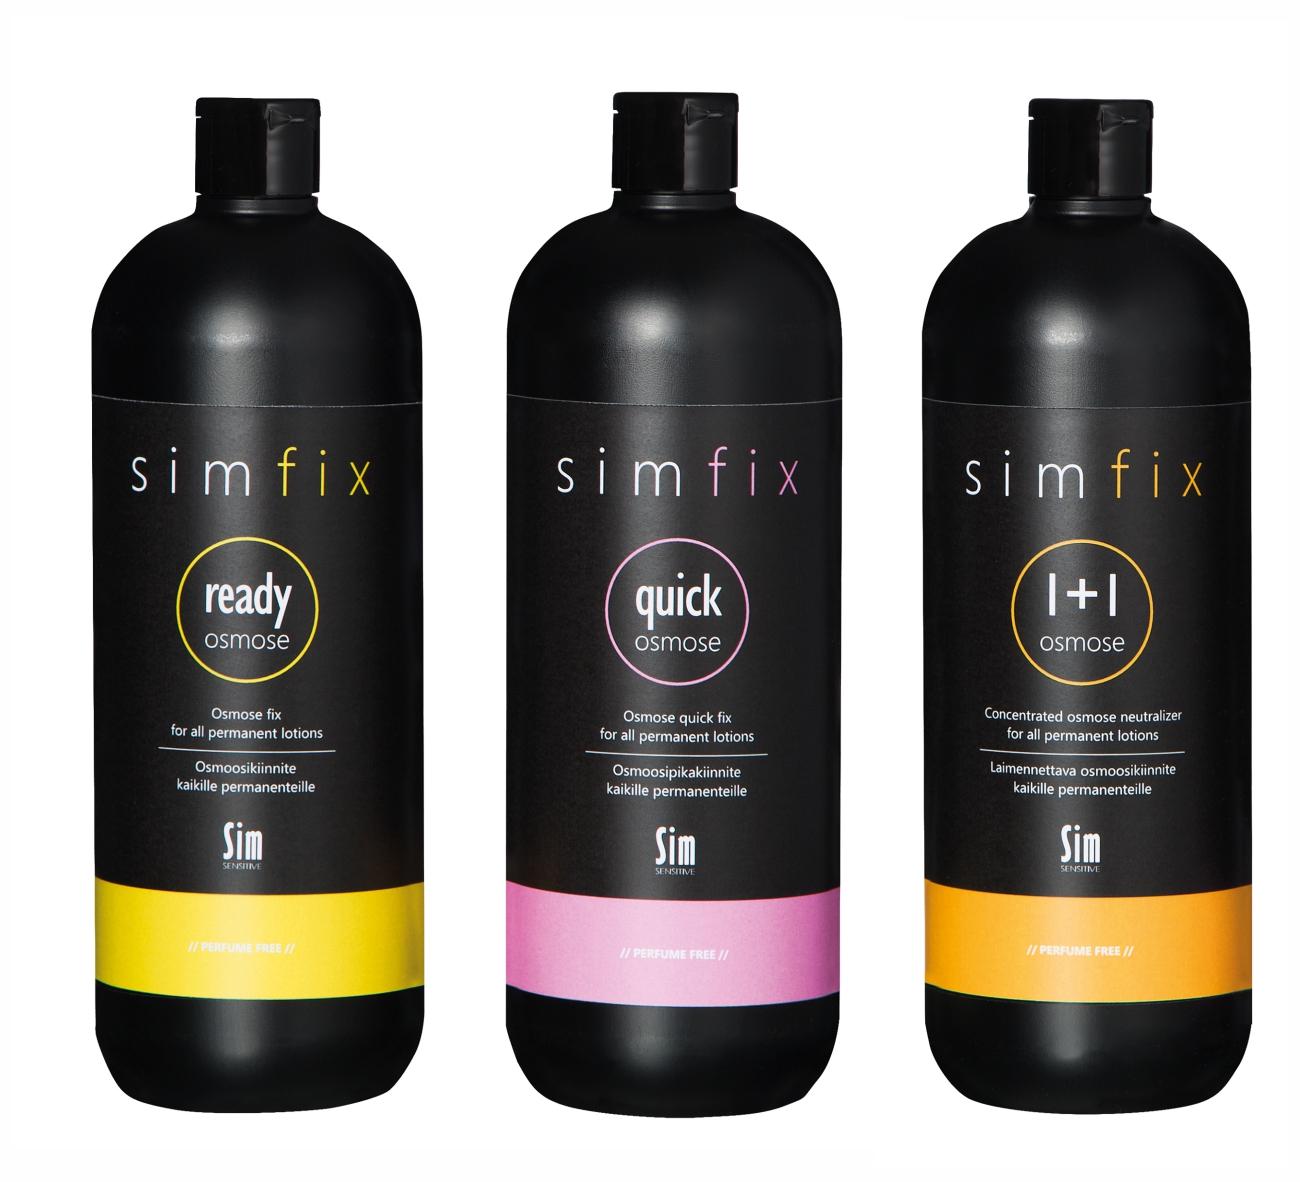 SimFix